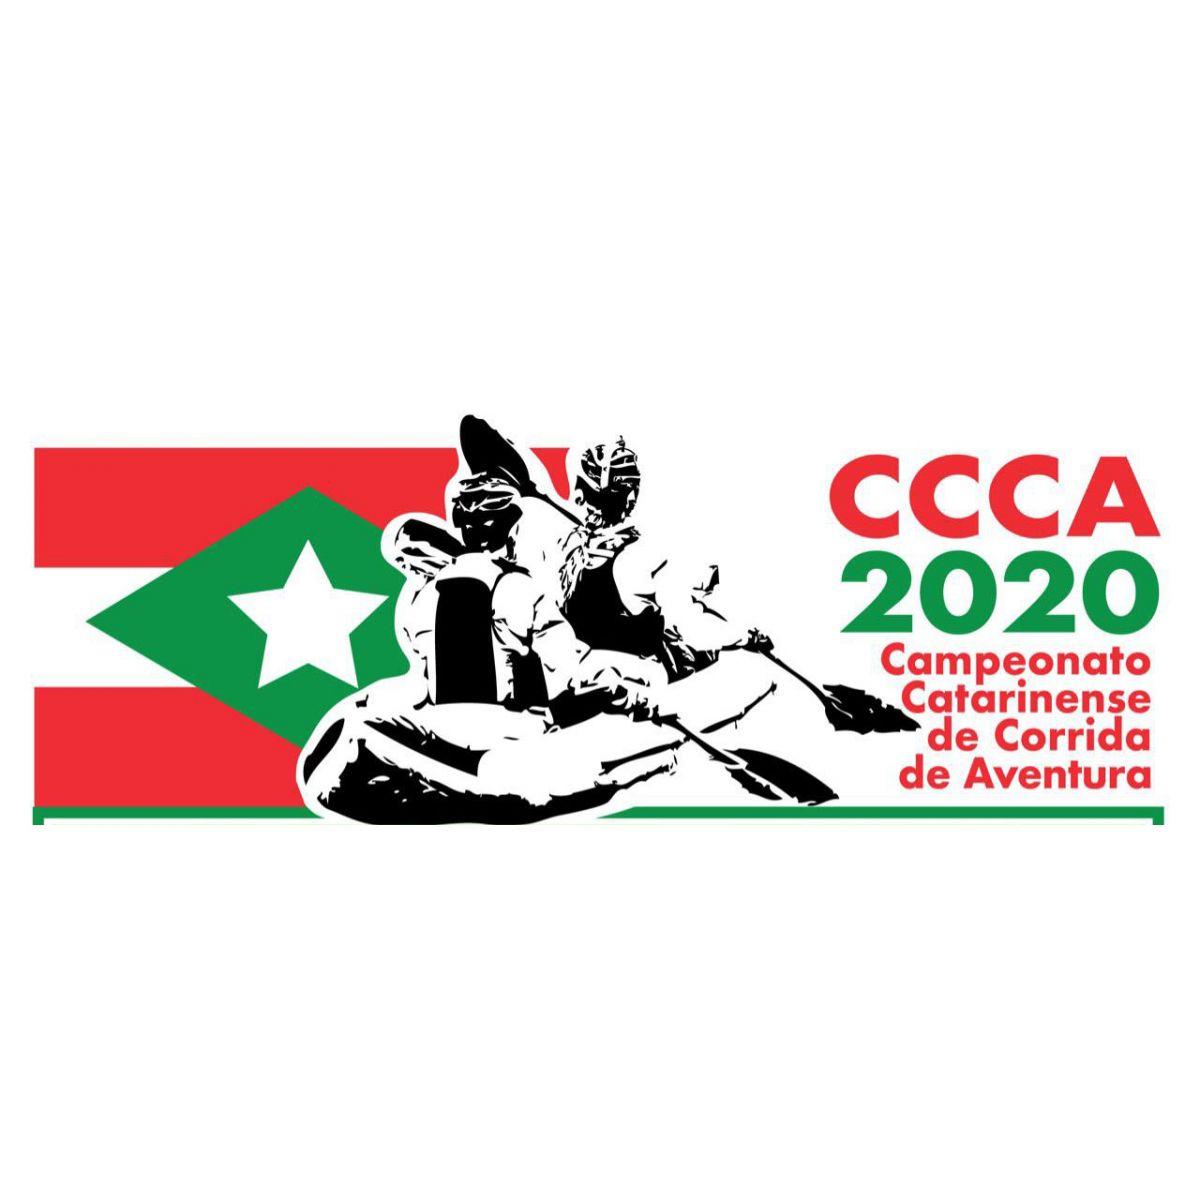 CCCA 2021 Campeonato Catarinense de Corrida de Aventura